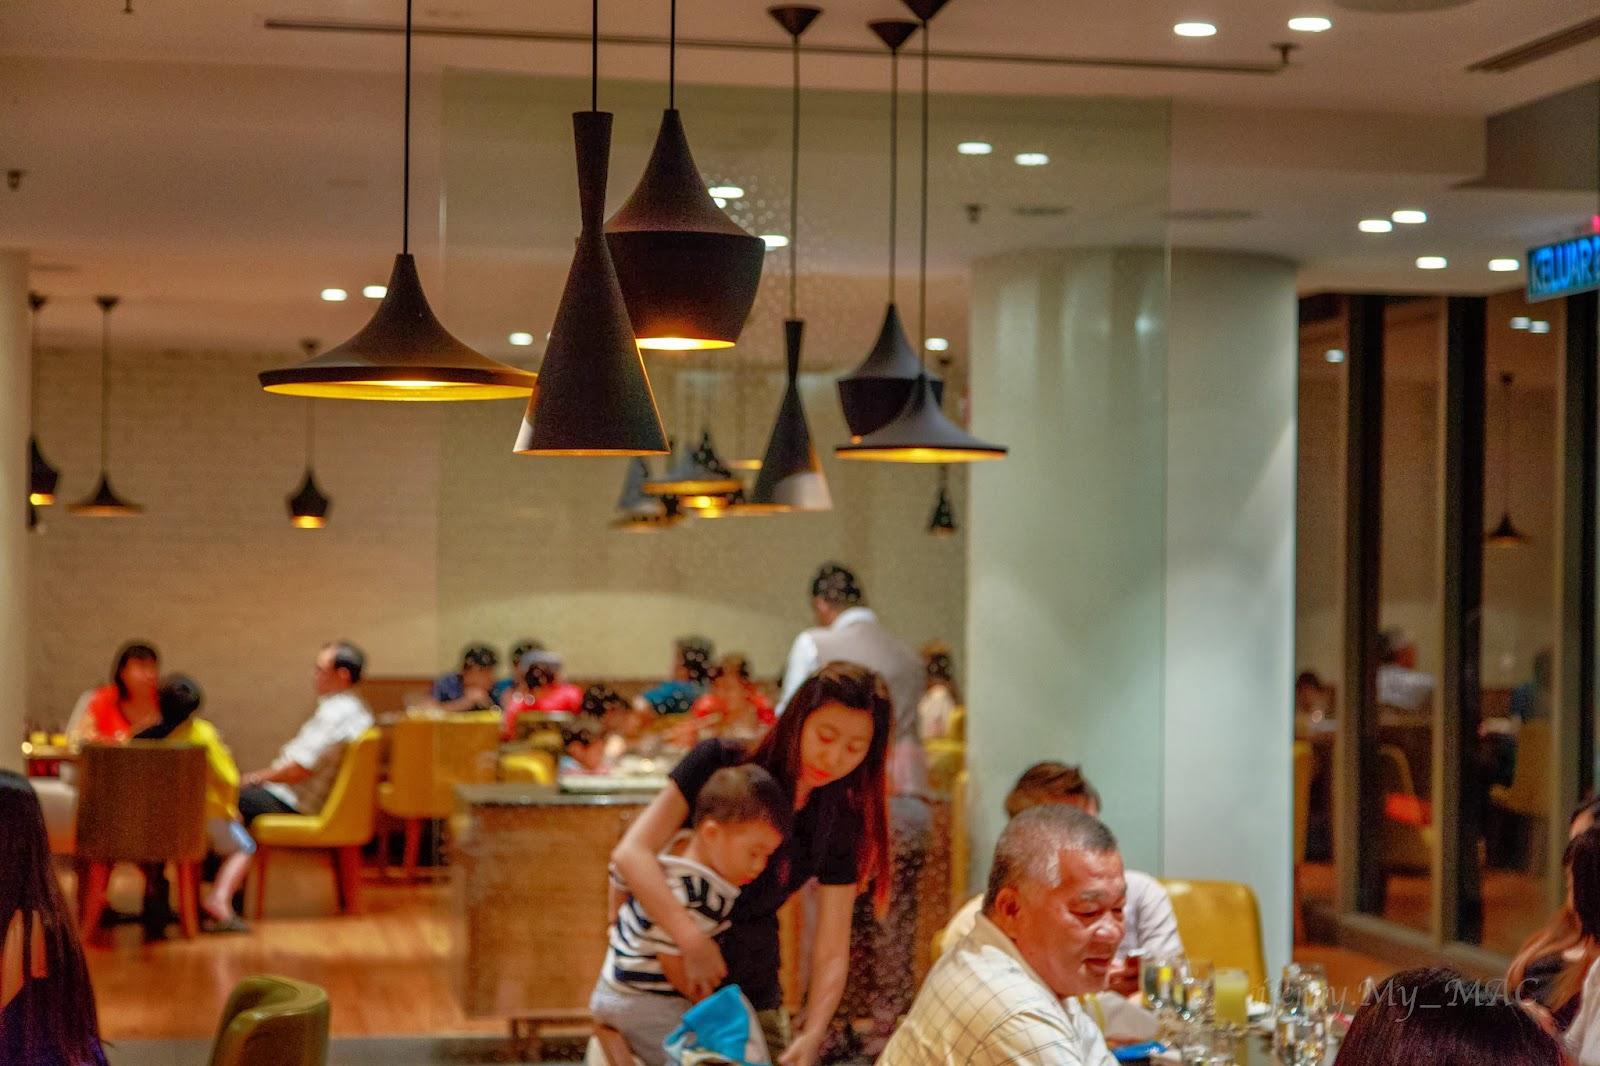 White Kitchen Buffet Remodeling Houston 倡所欲言 柔佛 新山万丽酒店自助餐 Renaissance Johor Bahru Hotel 这5星级的酒店最大买点之一就是cafe Bld 的自助餐 餐厅以经营奢华的自助餐为主 开放式厨房为食客们提供地道的本地风味美食 冷盘 有机沙拉 寿司以及新鲜海鲜等众多